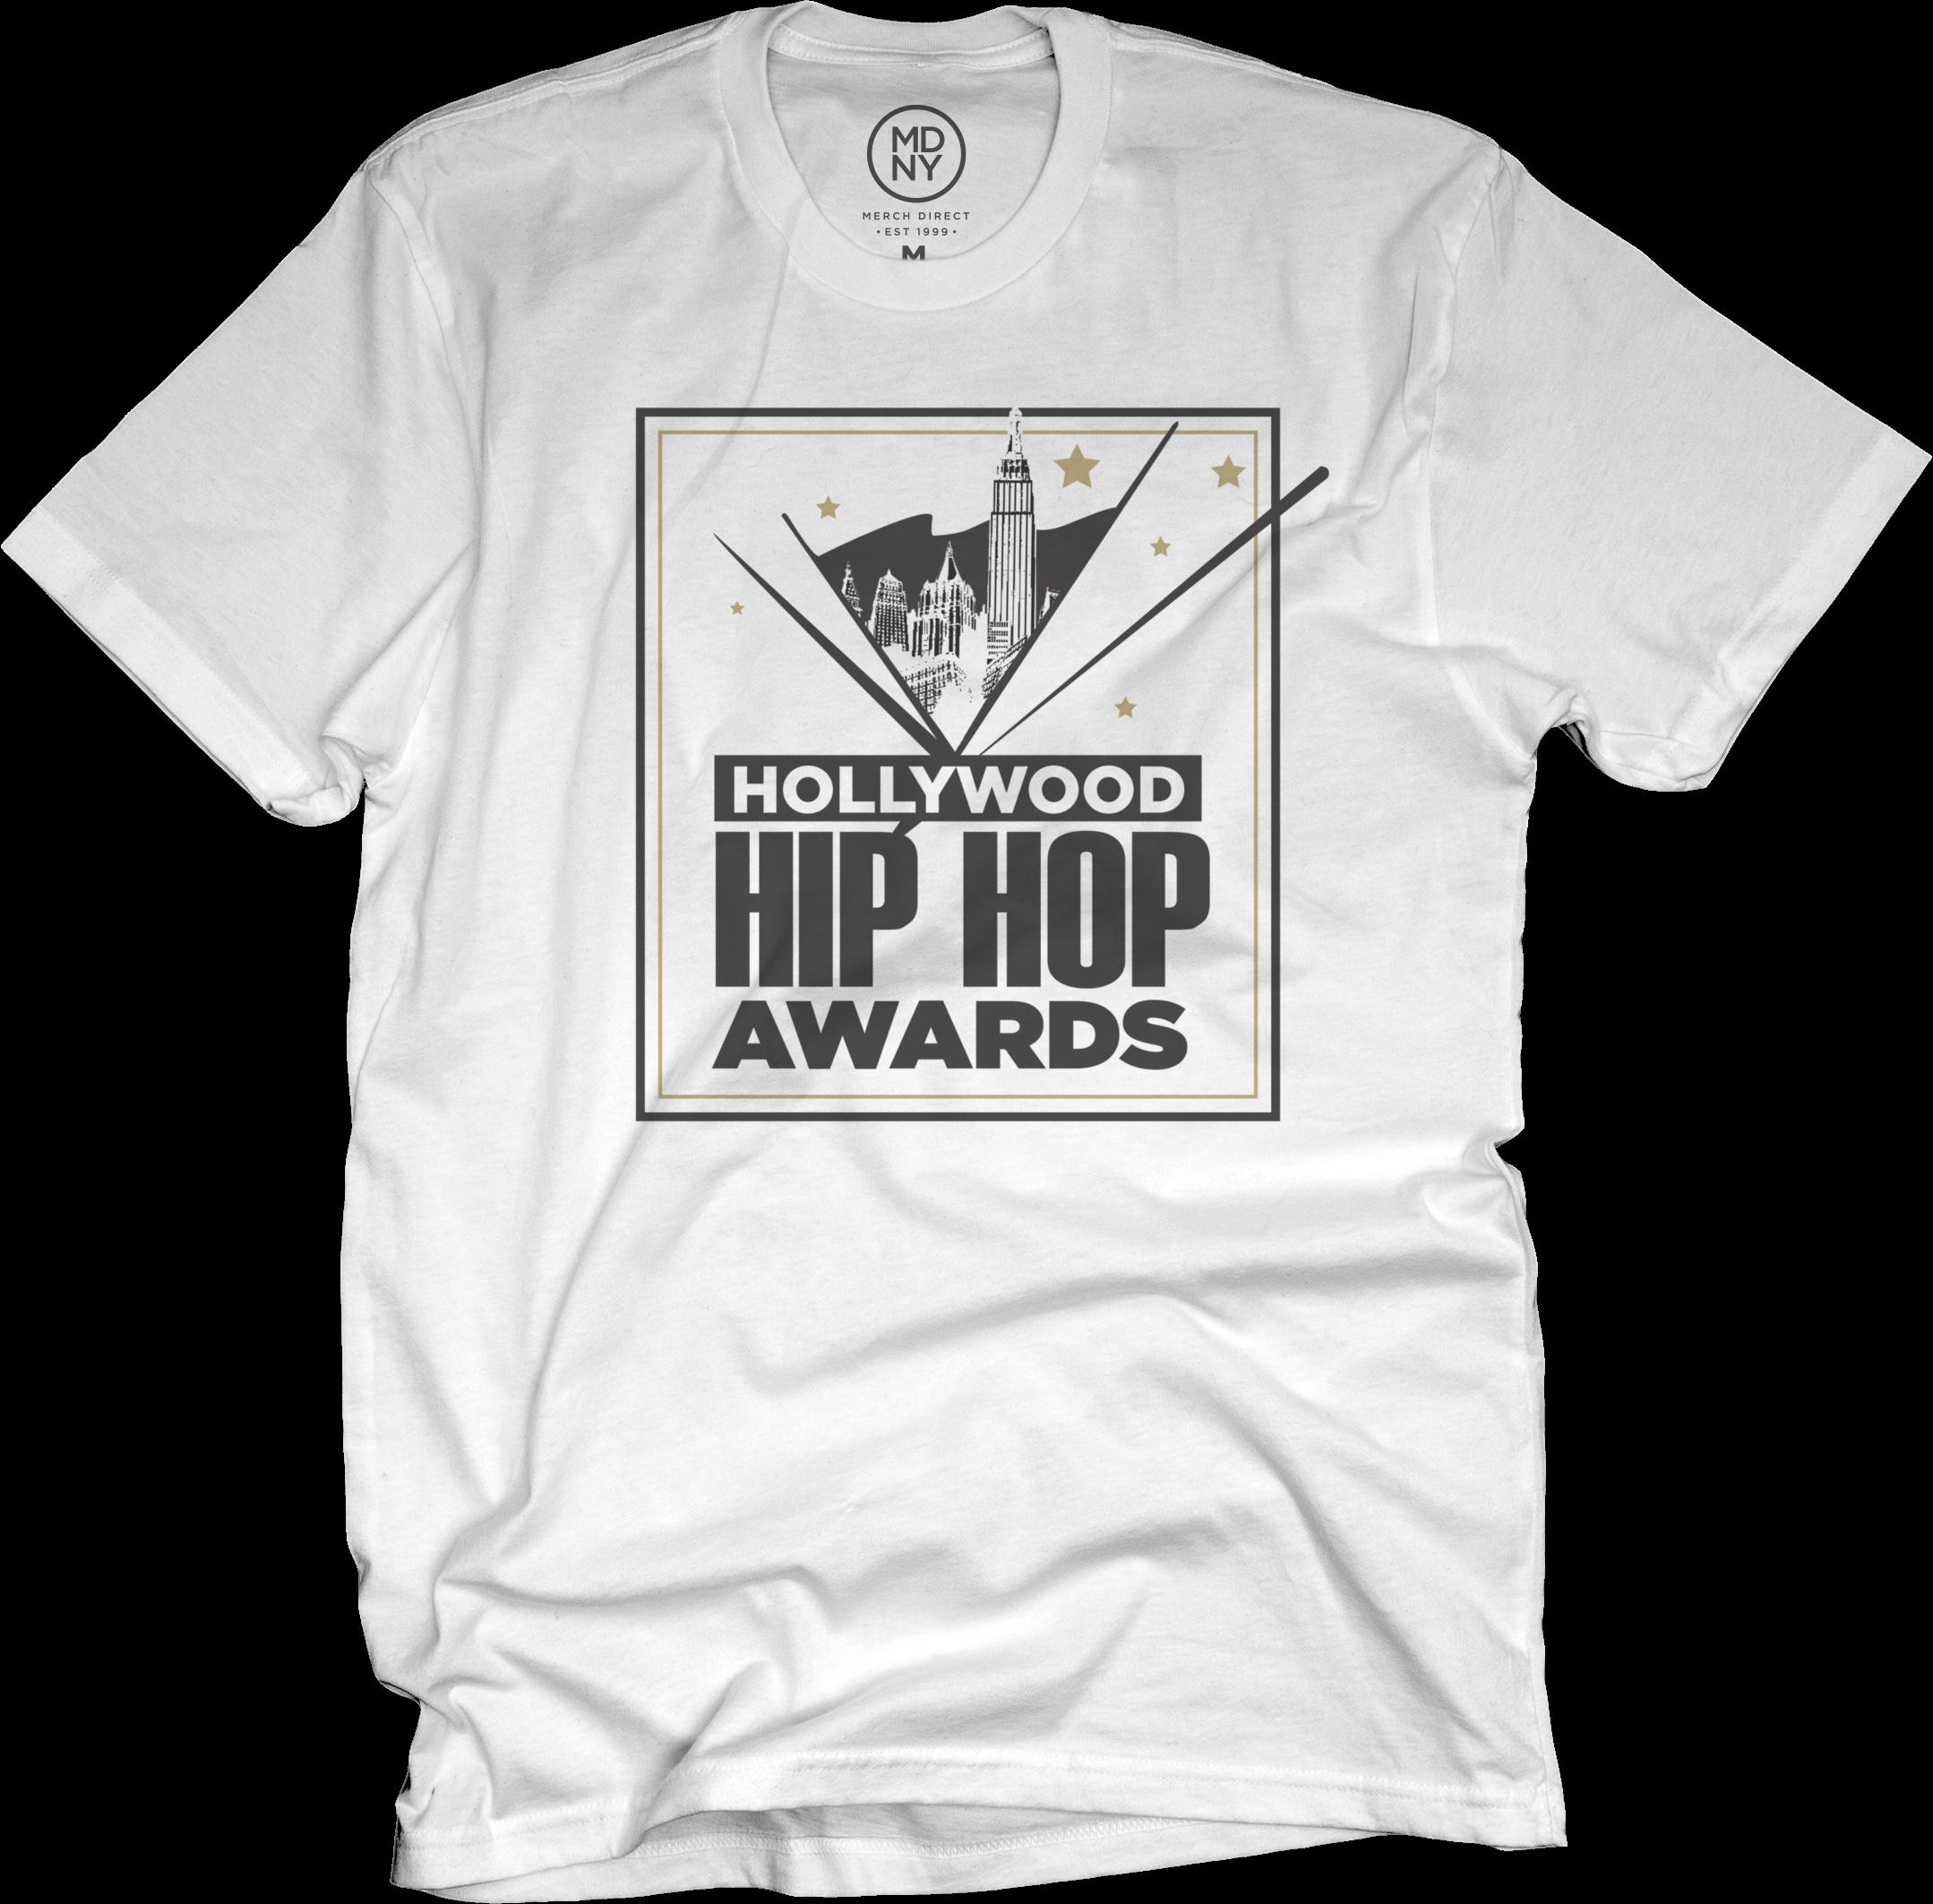 Hollywood Hip Hop Awards